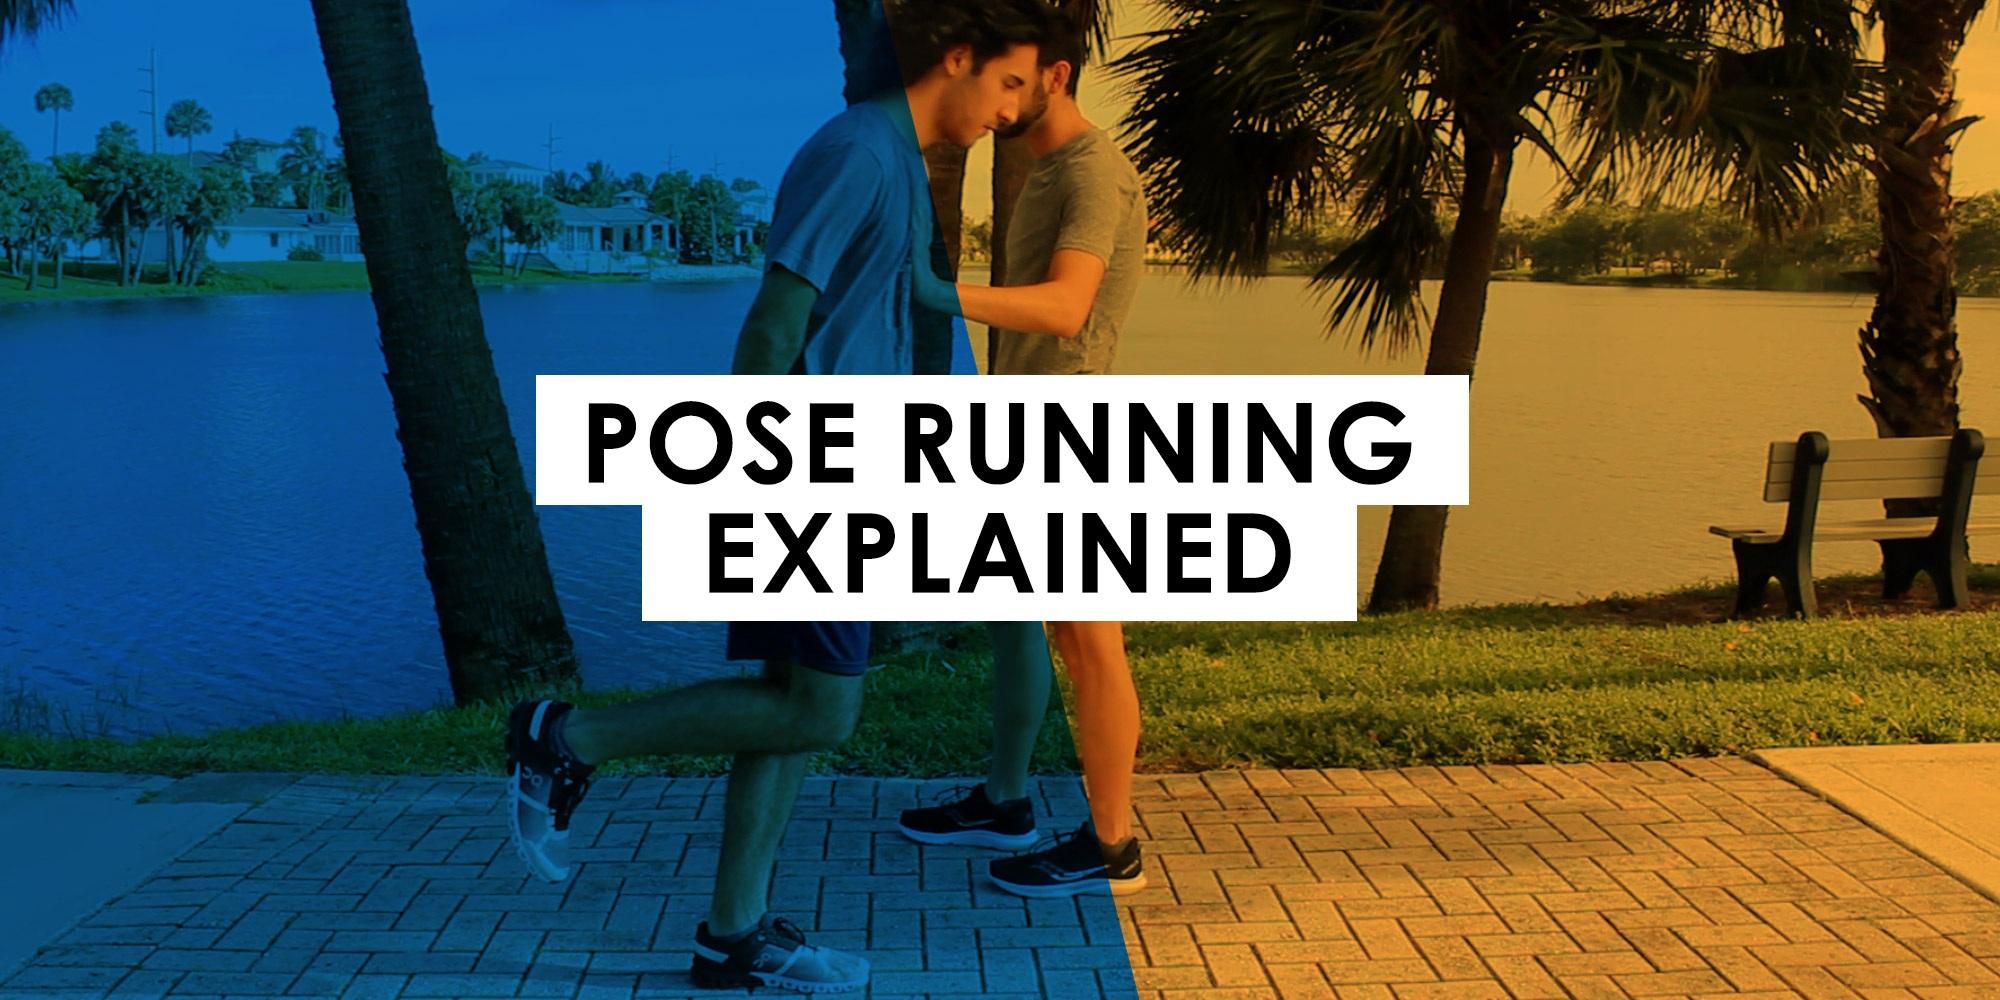 Pose Running Explained